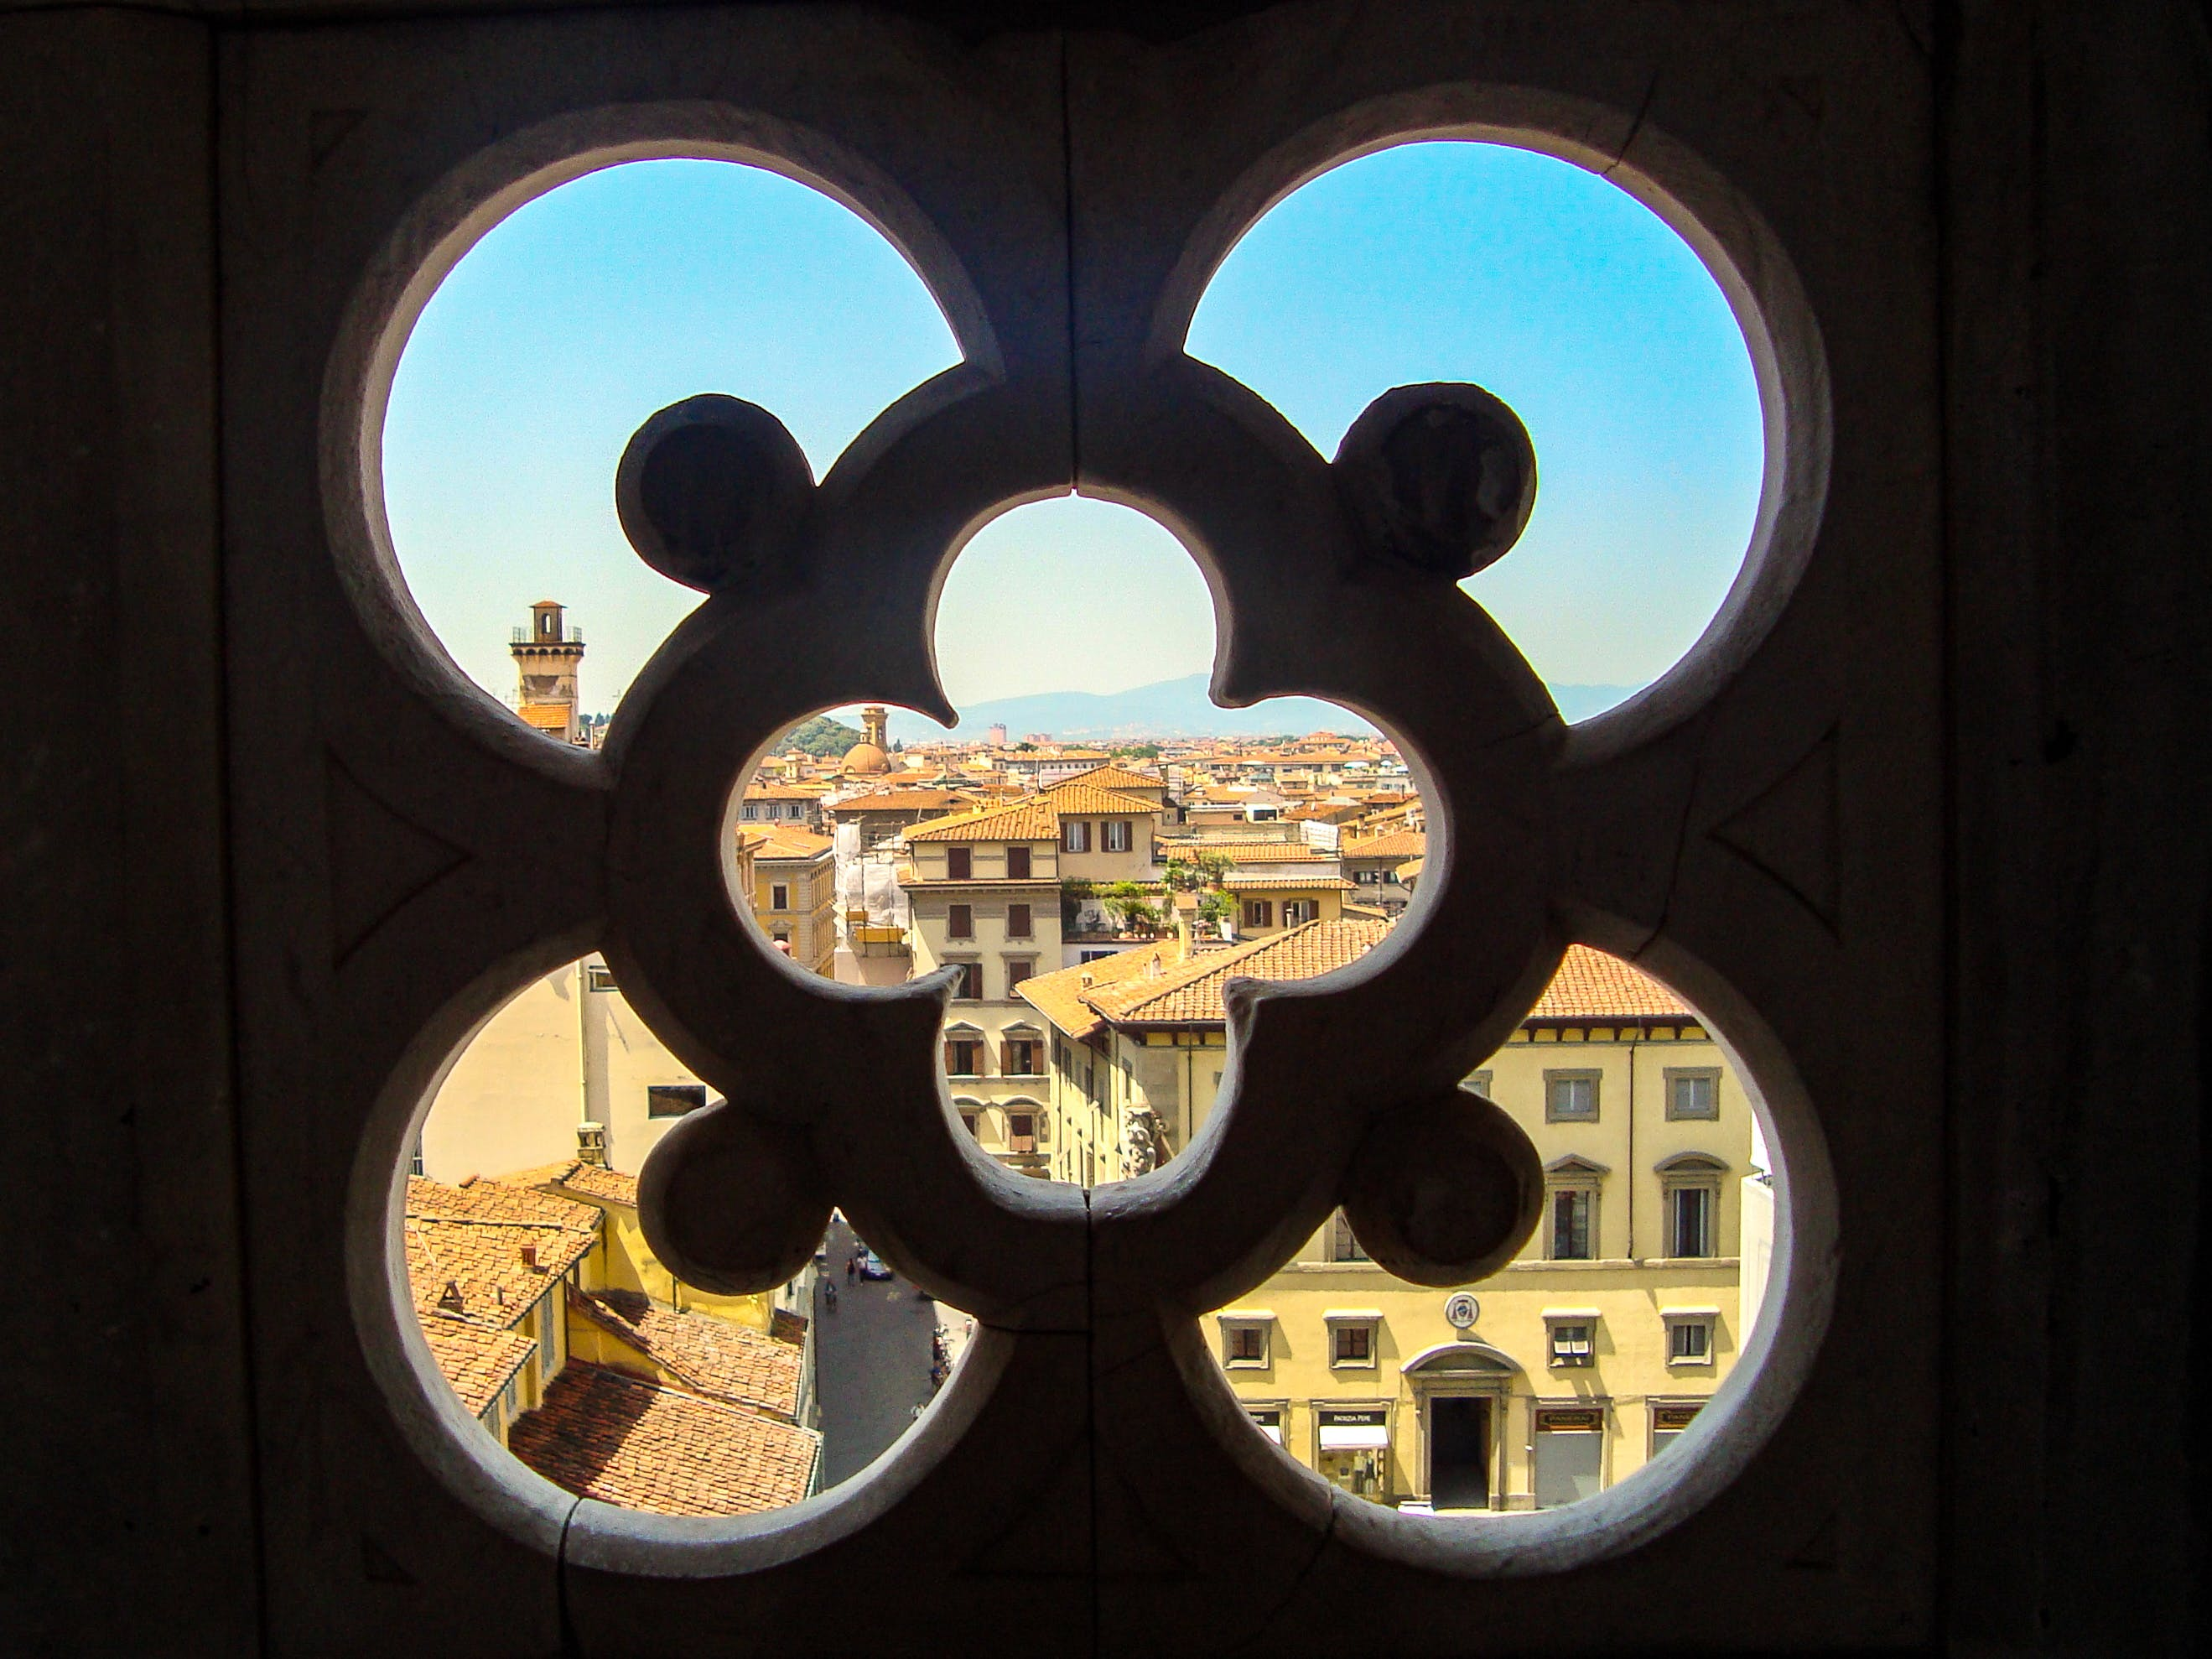 Gratis stockfoto met antiek, architectuur, designen, fel